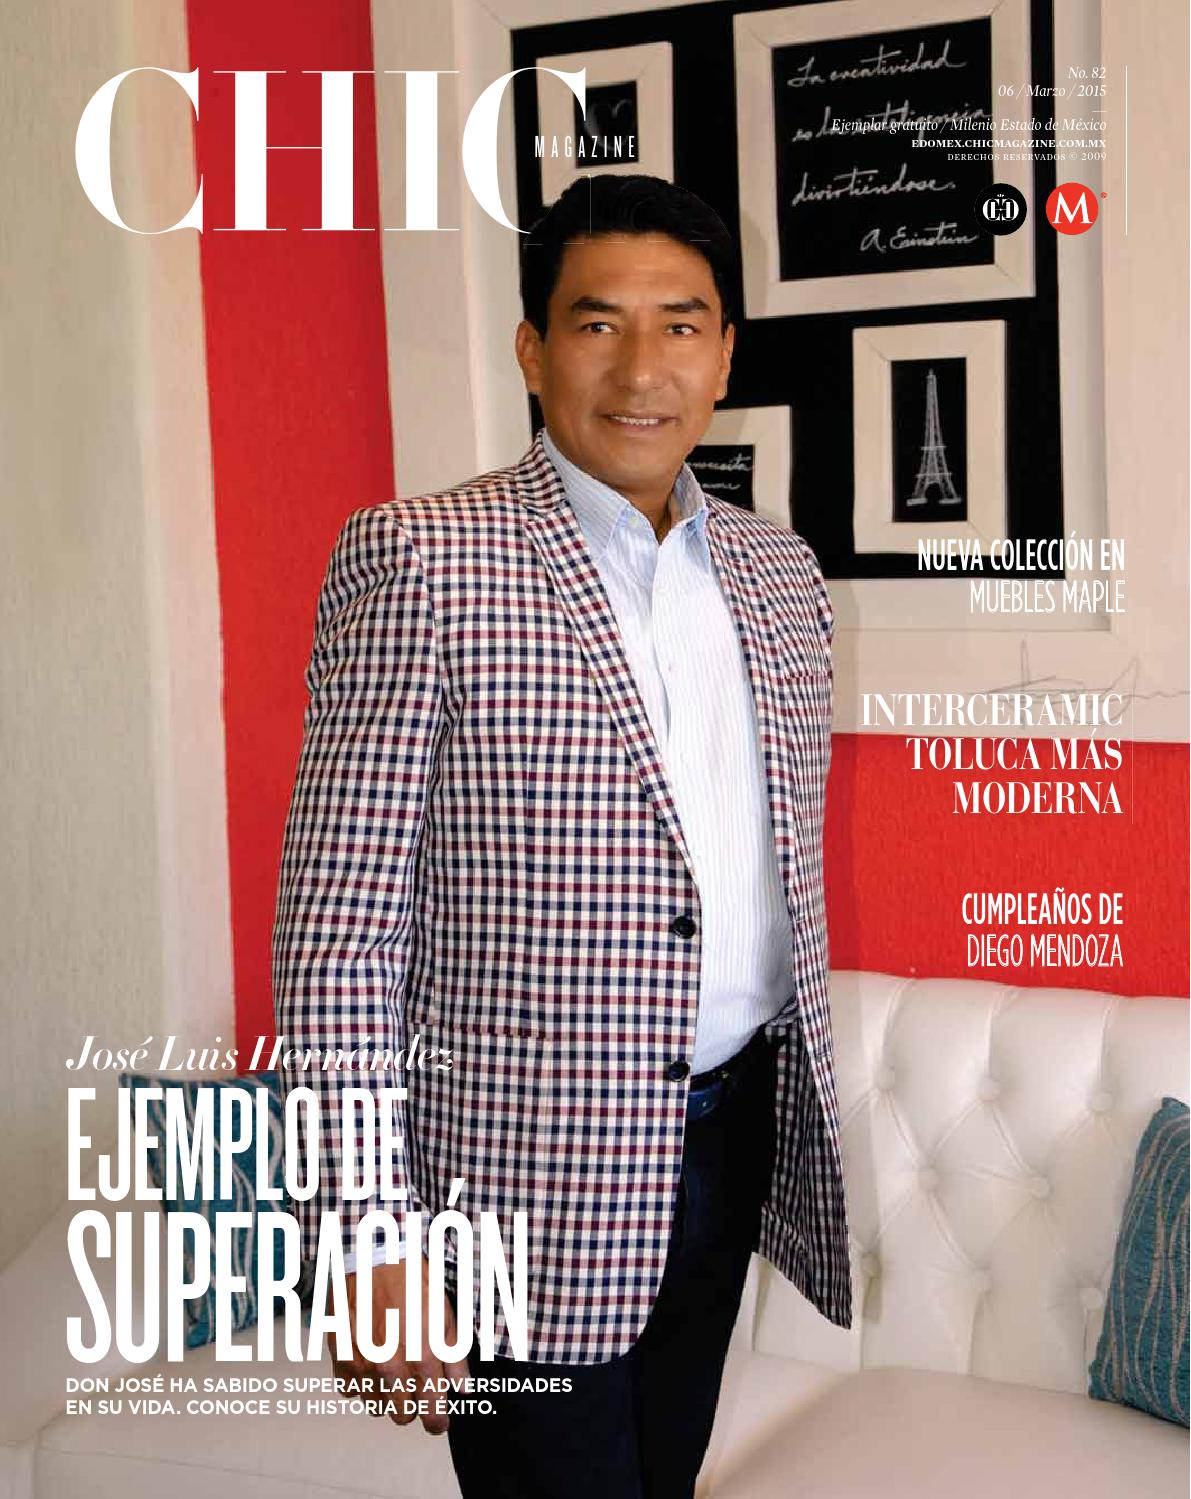 Chic Magazine Edomex Edici N 82 By Chic Magazine Estado De M Xico  # Muebles Tultepec Toluca